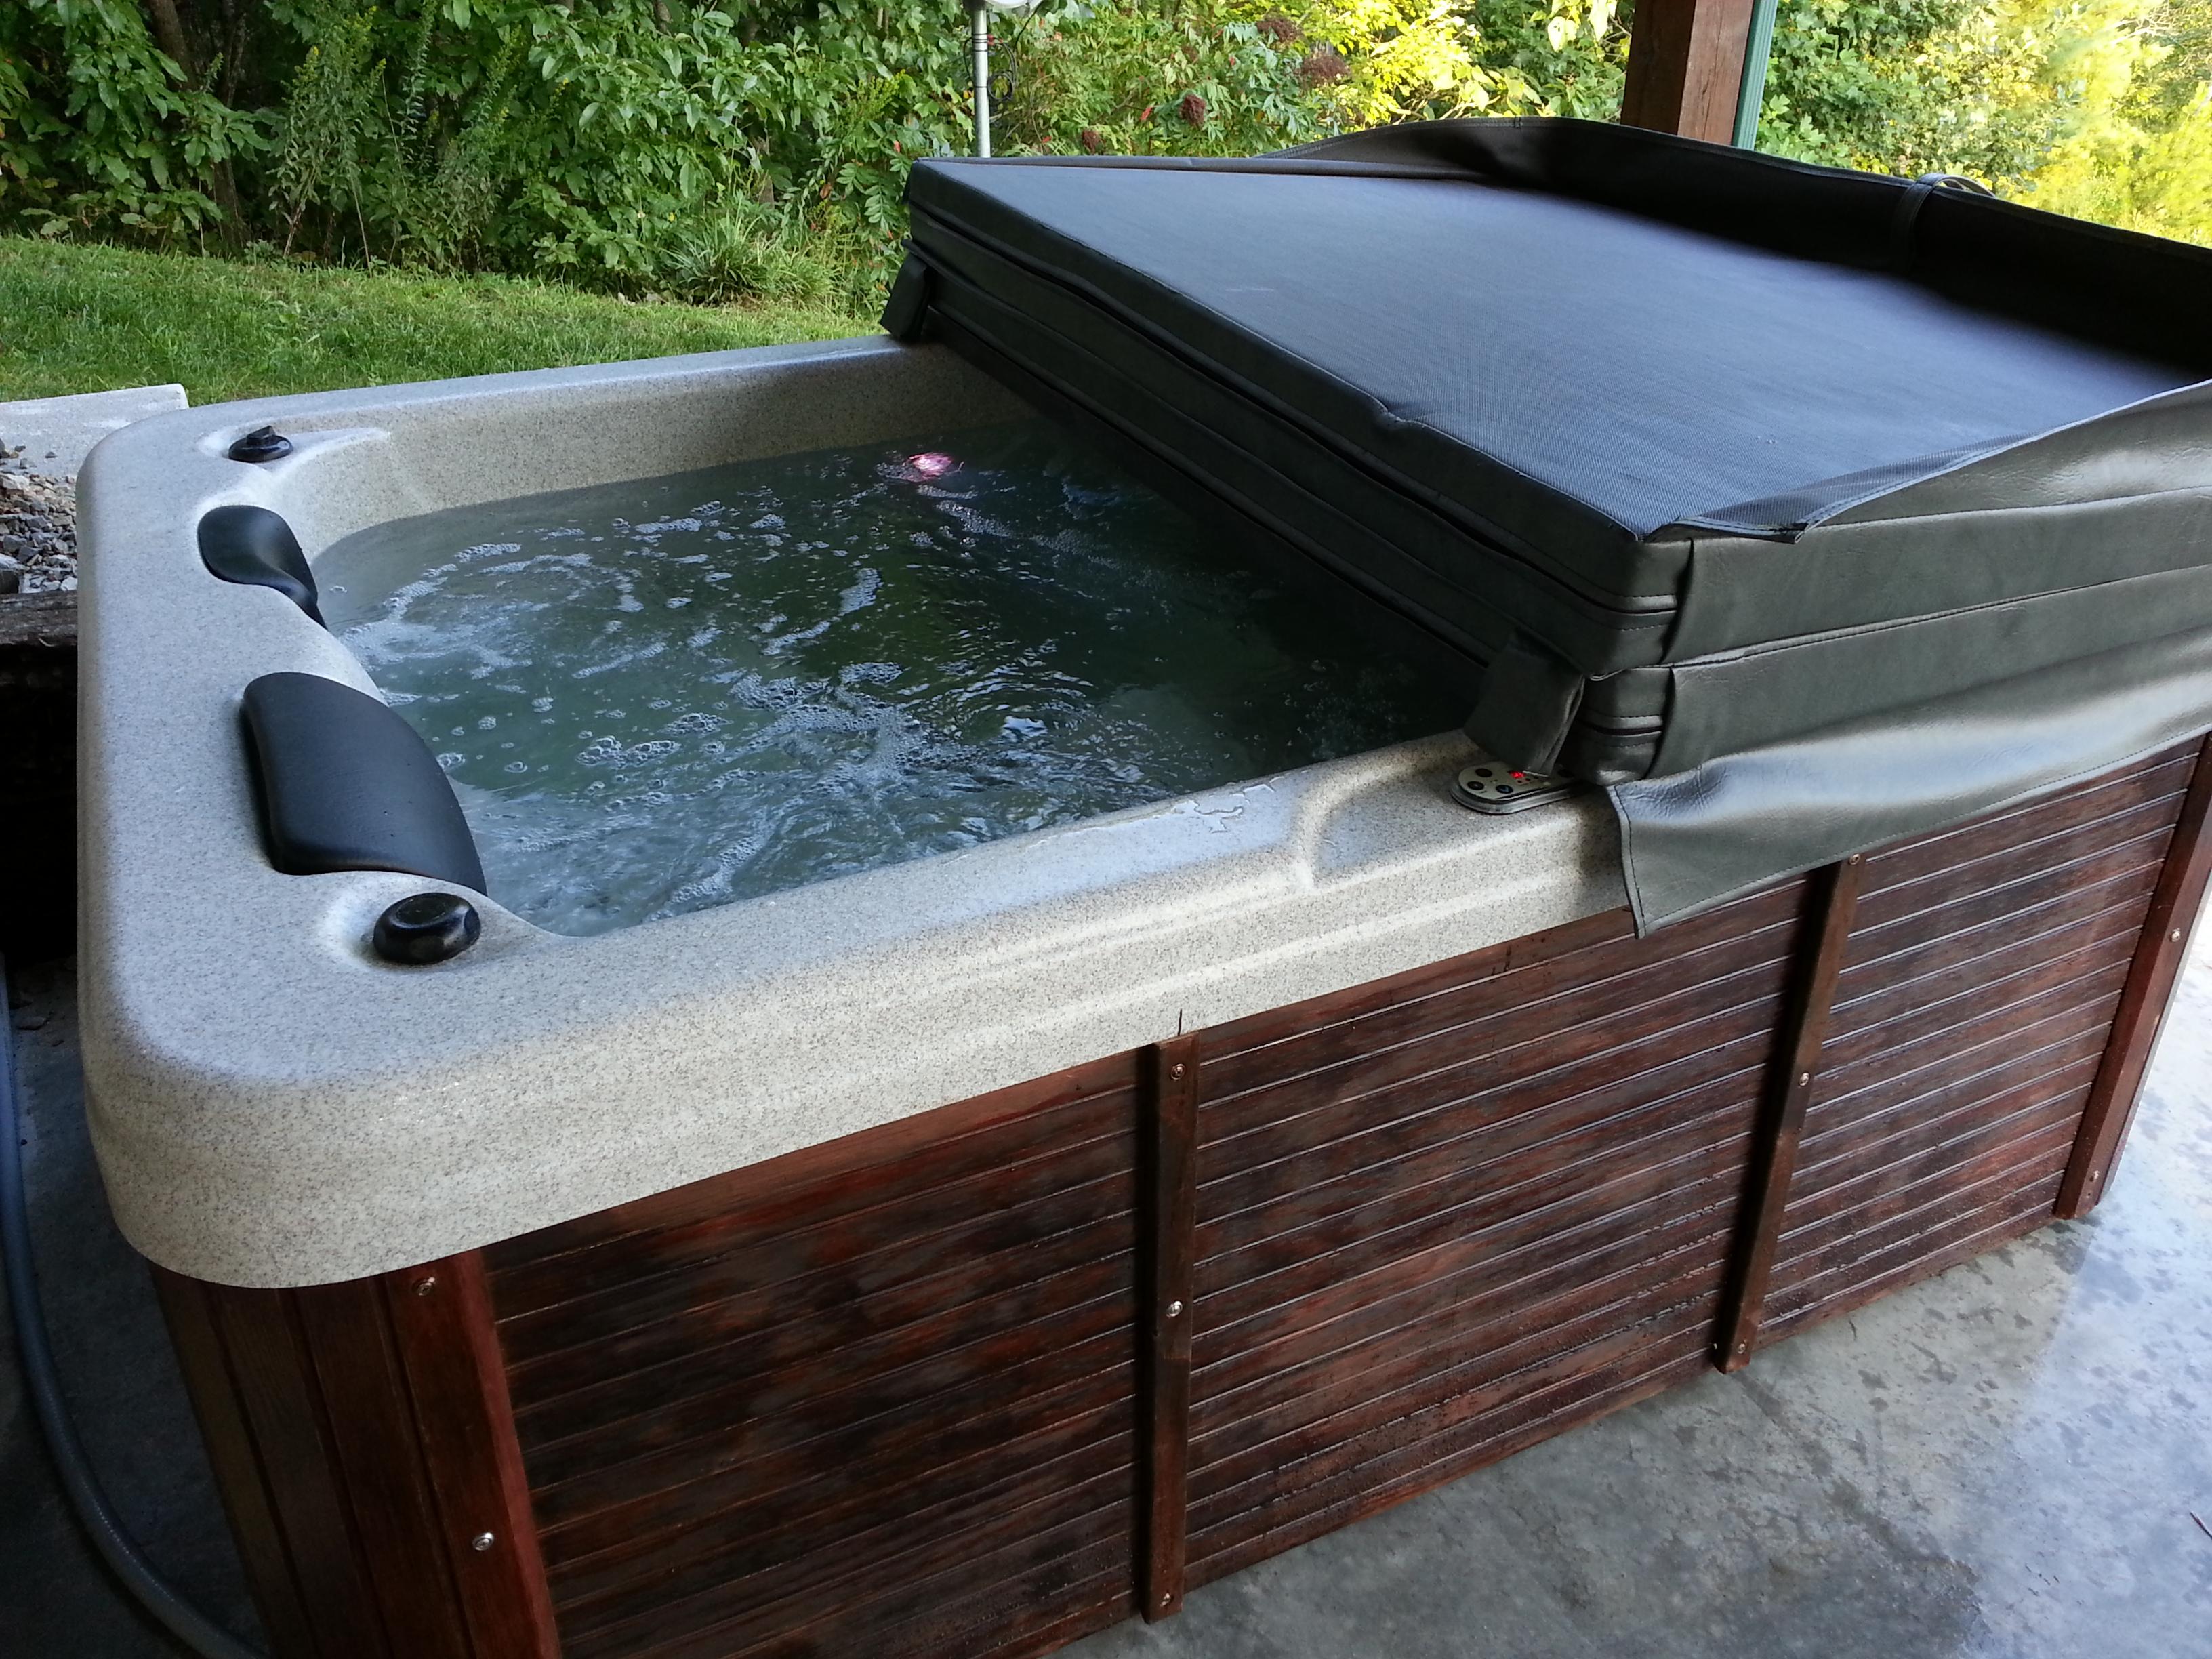 Refurbished Tub!